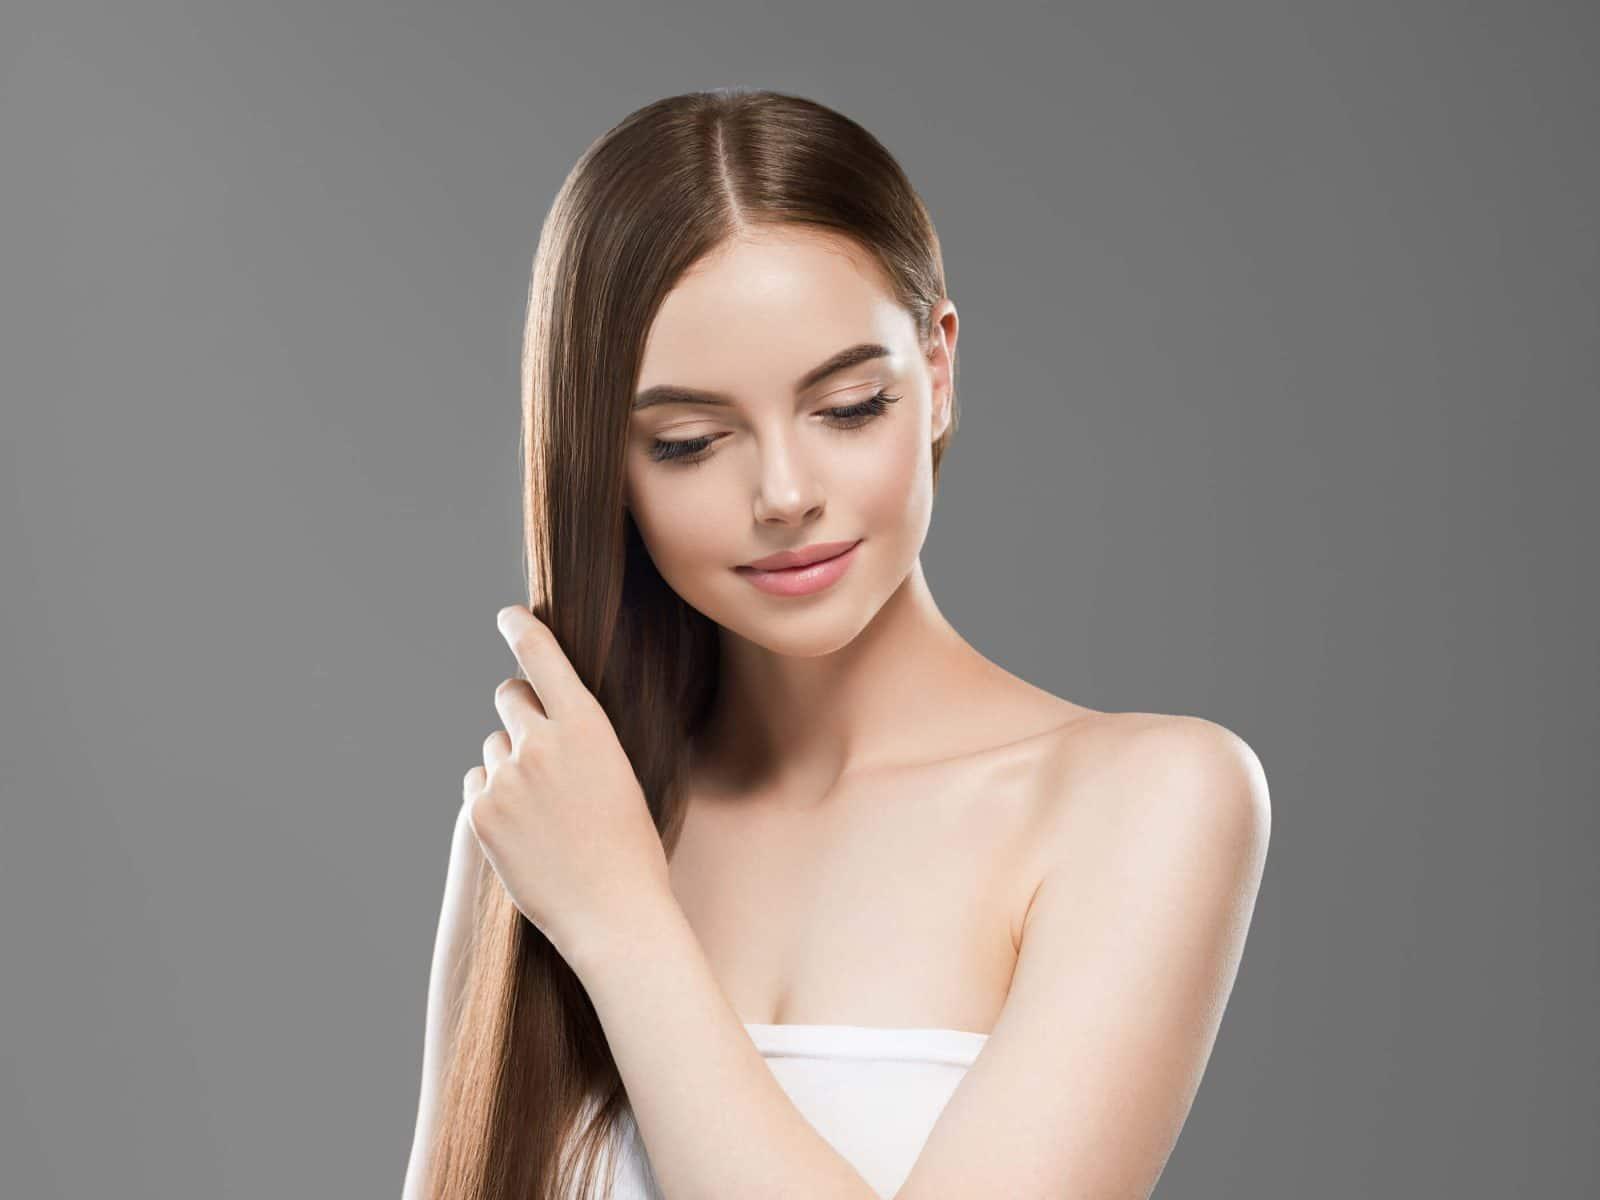 beautiful long hair brunette woman with beauty hai CKT583Y 1